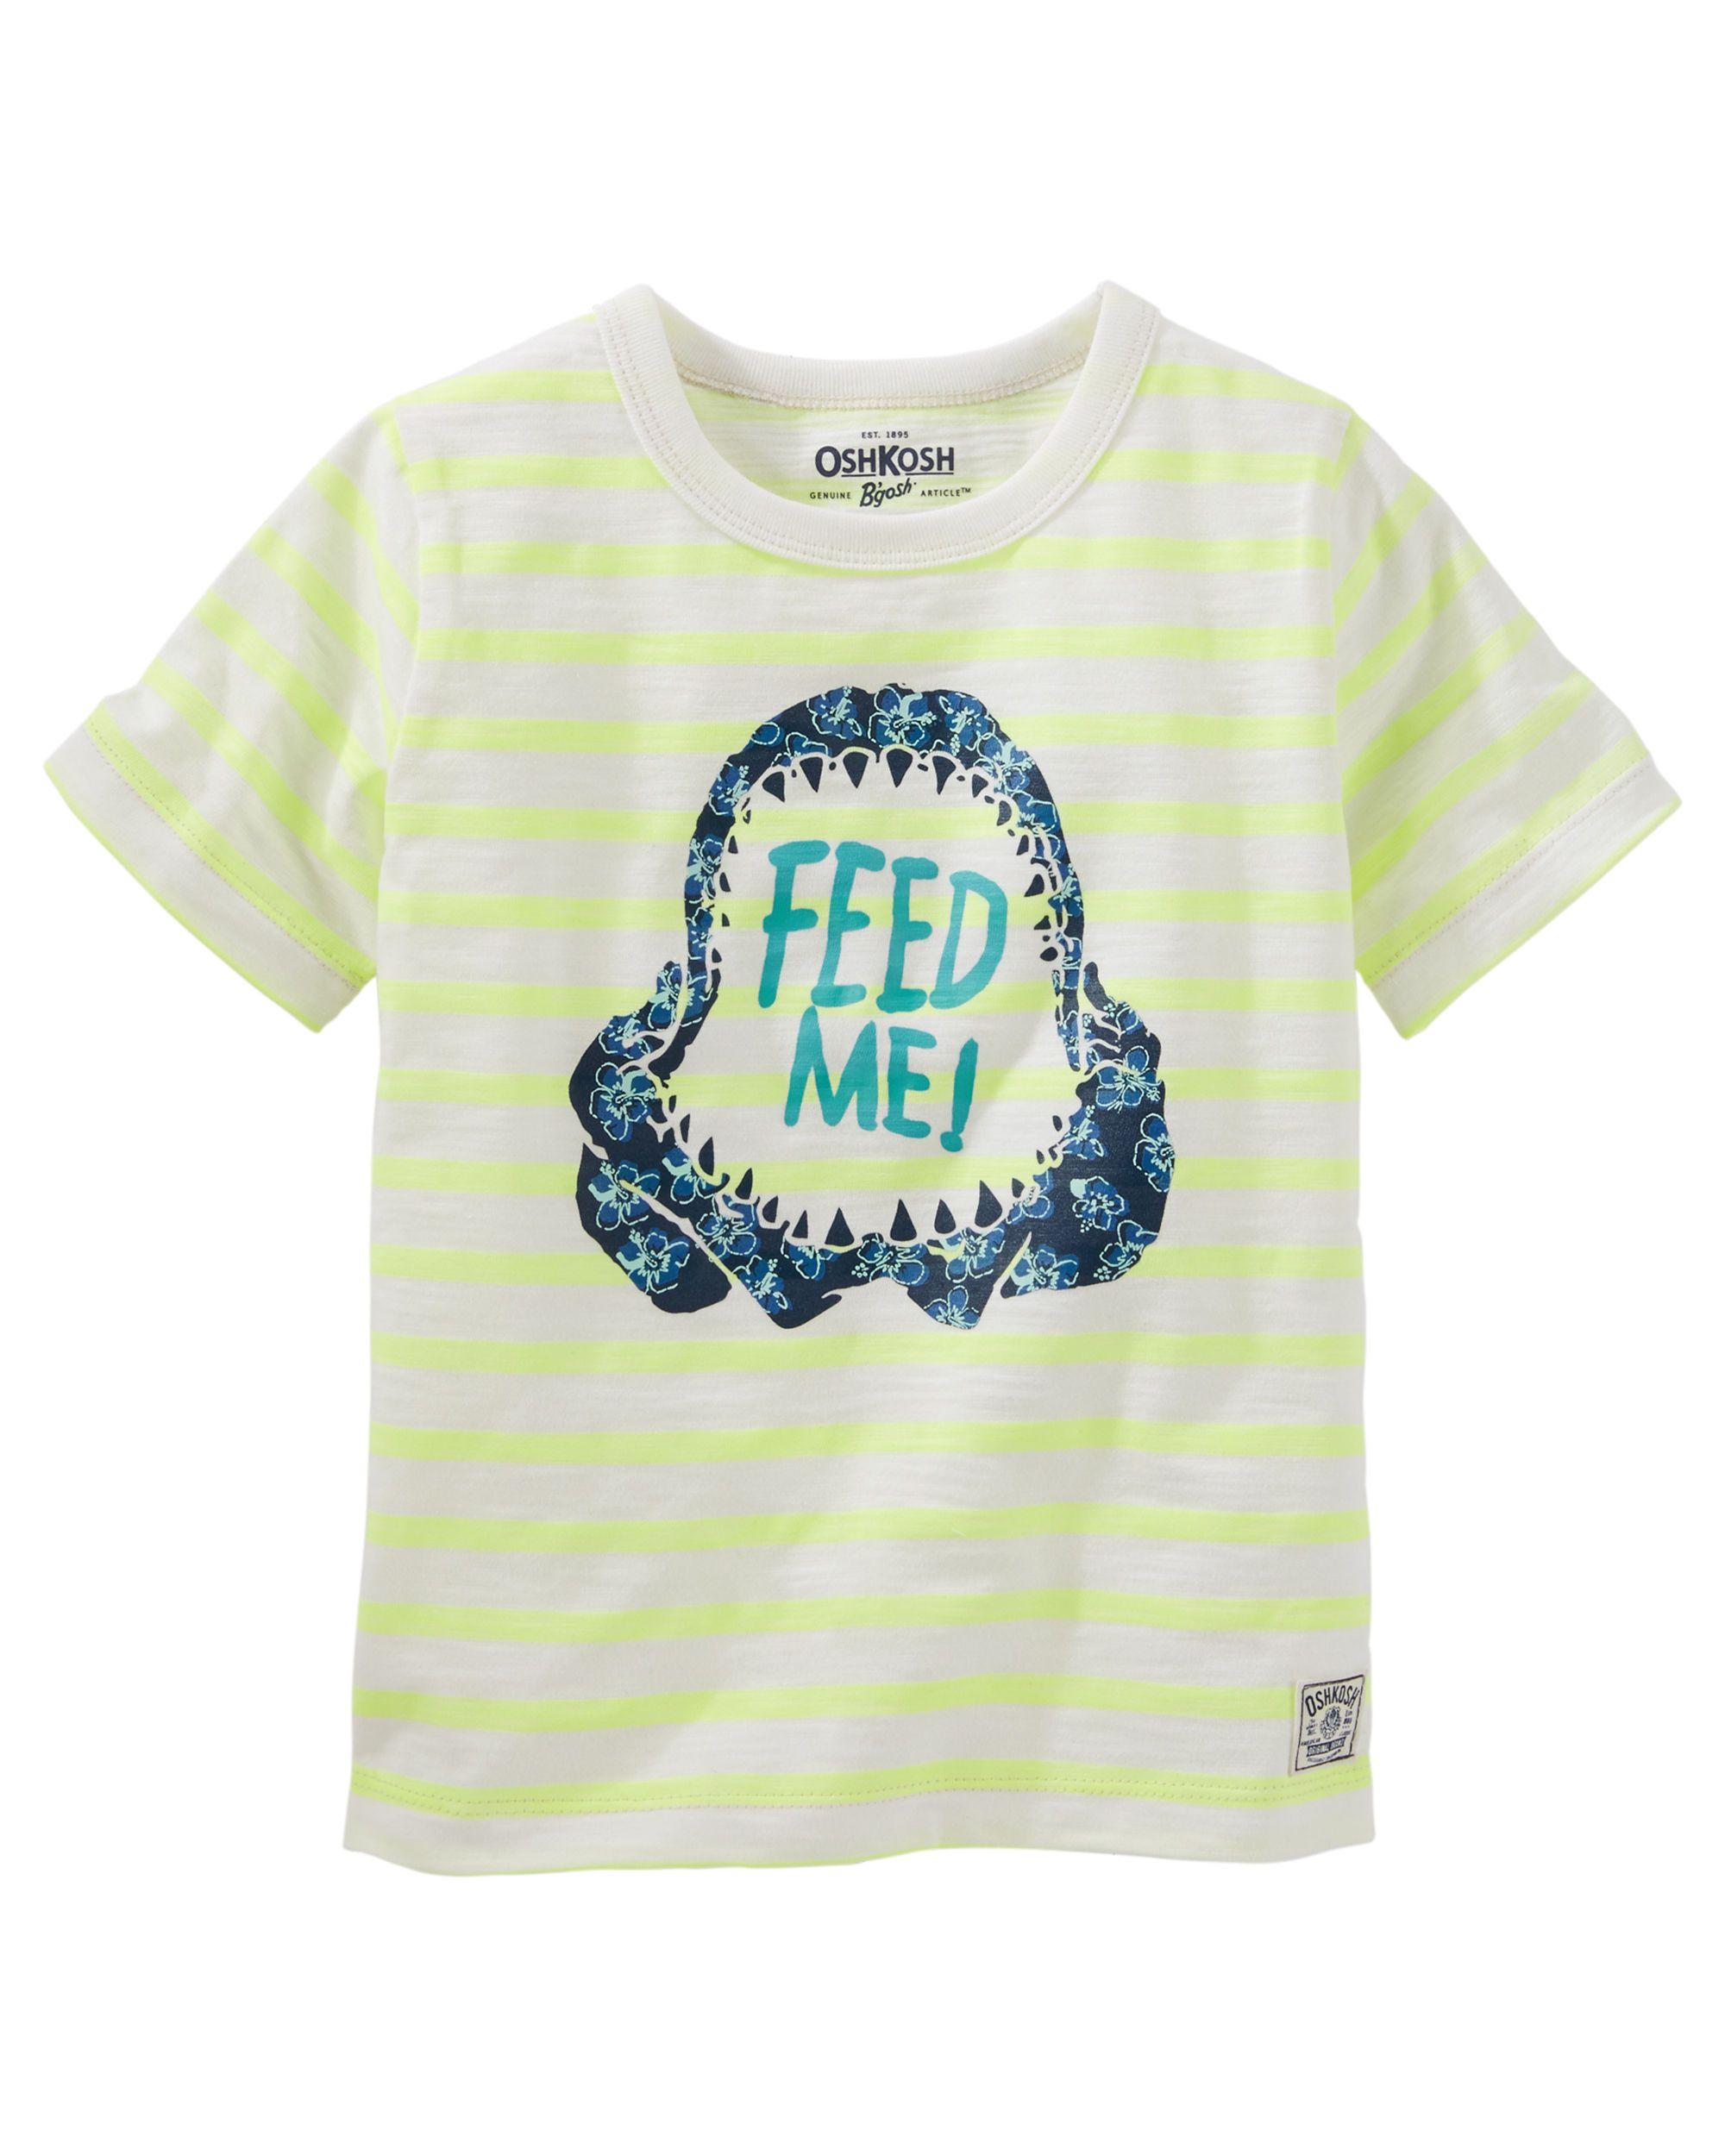 575ae4f2b Toddler Boy Neon Striped Tee | Carter's OshKosh Canada | Children ...